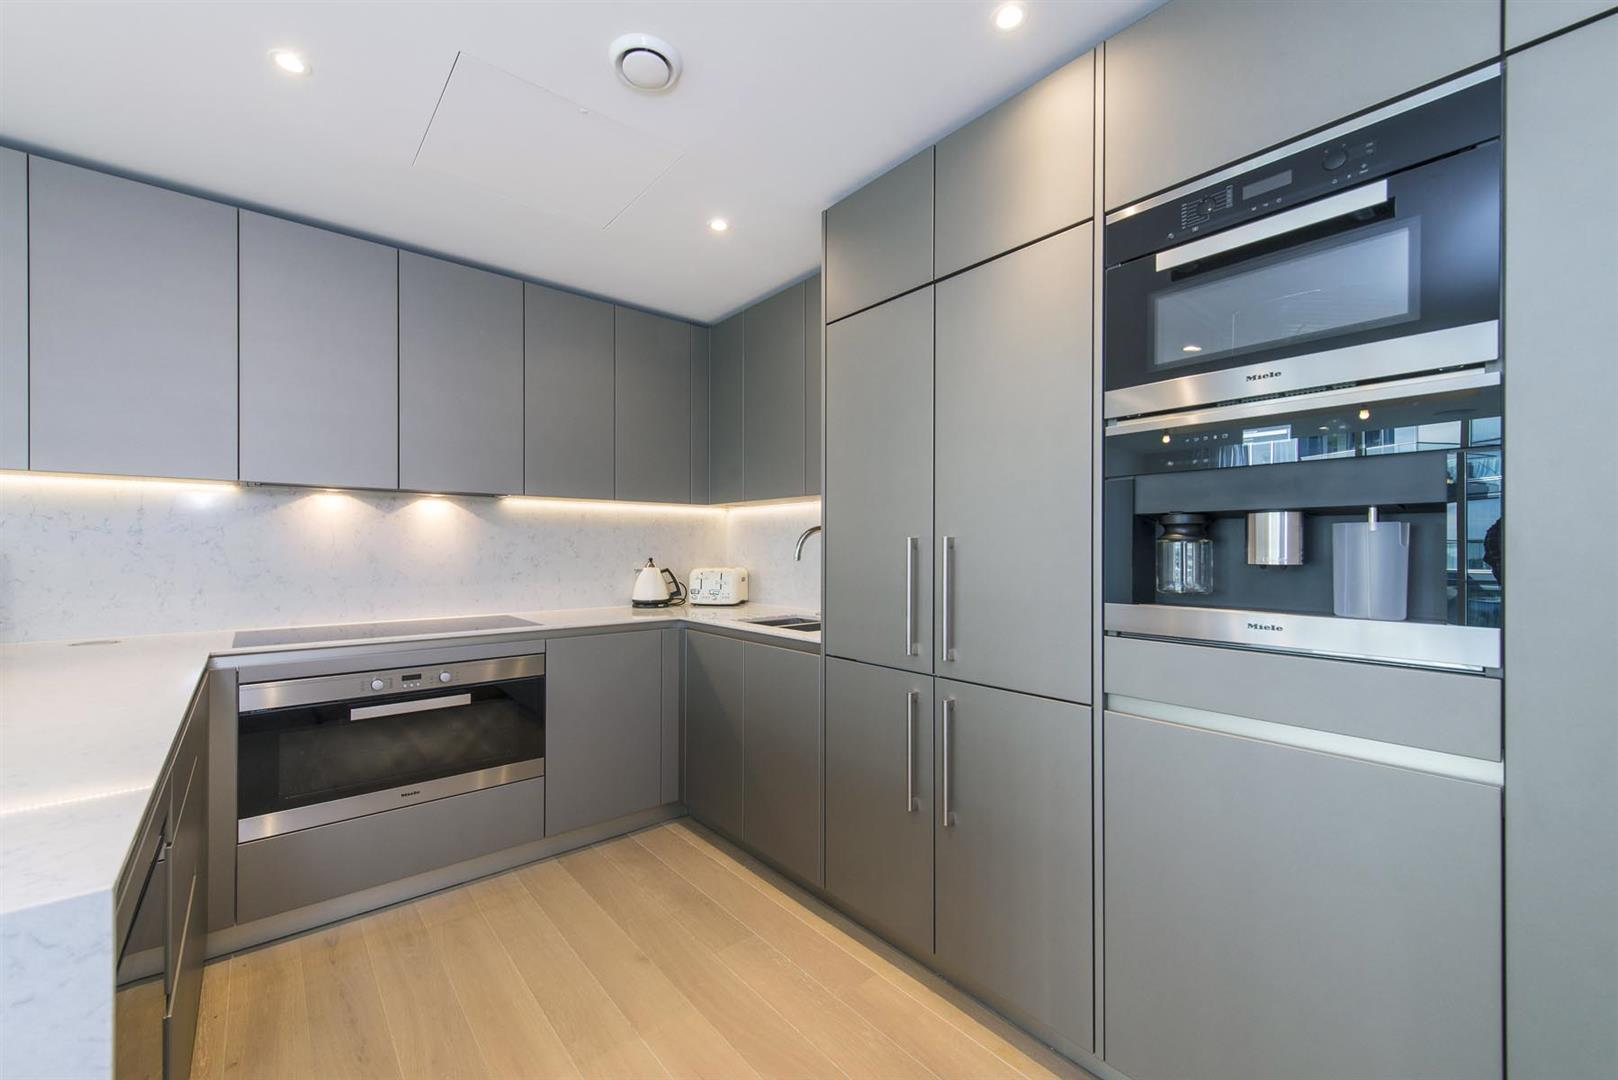 Miele,Kitchen